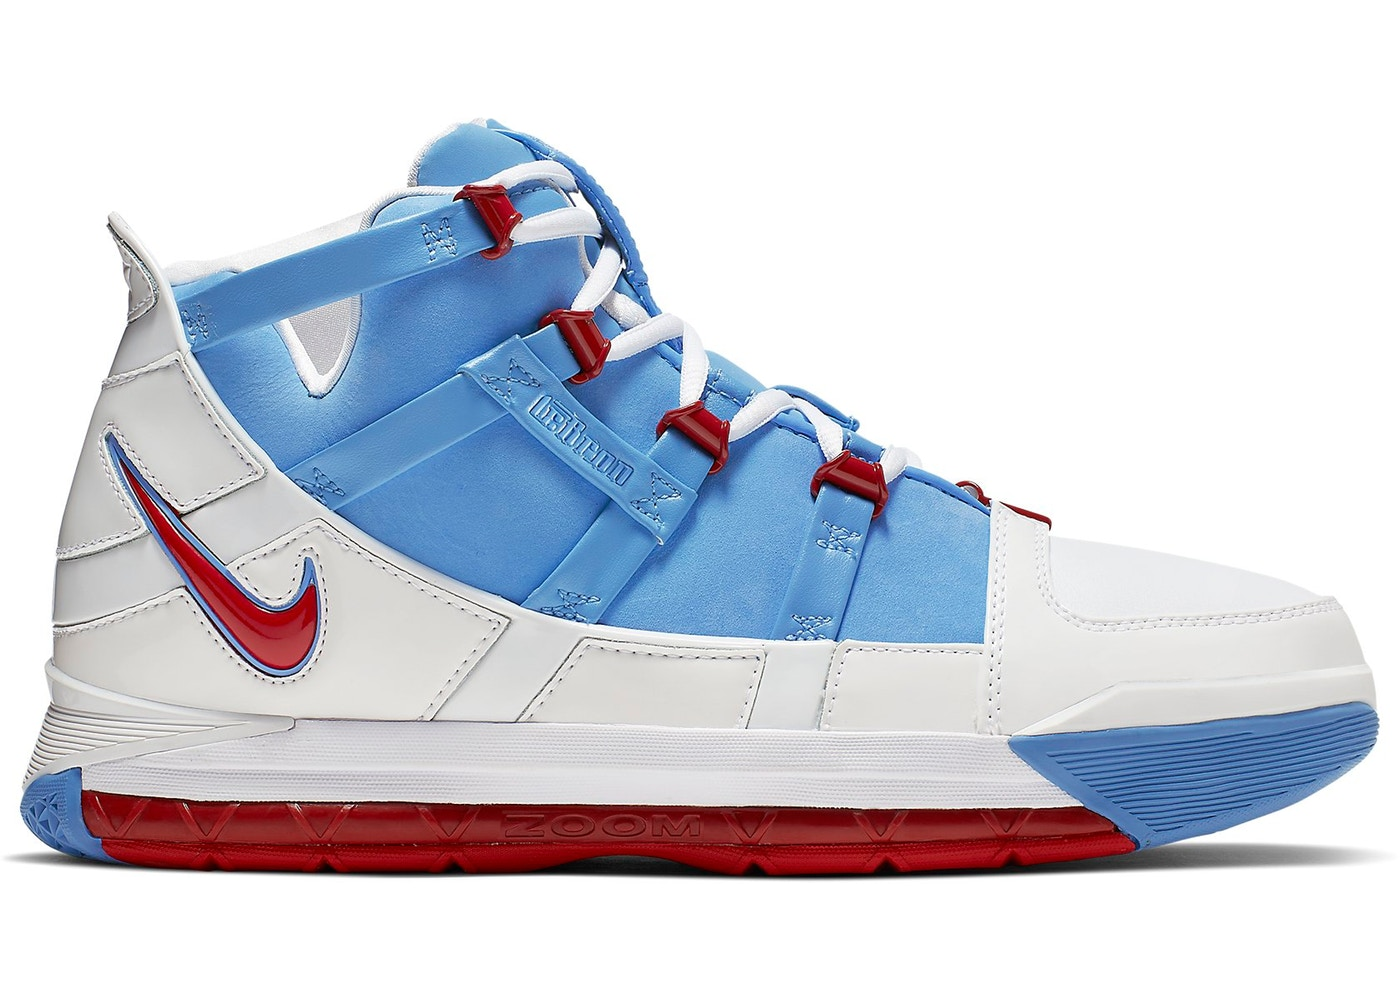 online store 3e4e7 8d6b5 Buy Nike LeBron Shoes   Deadstock Sneakers